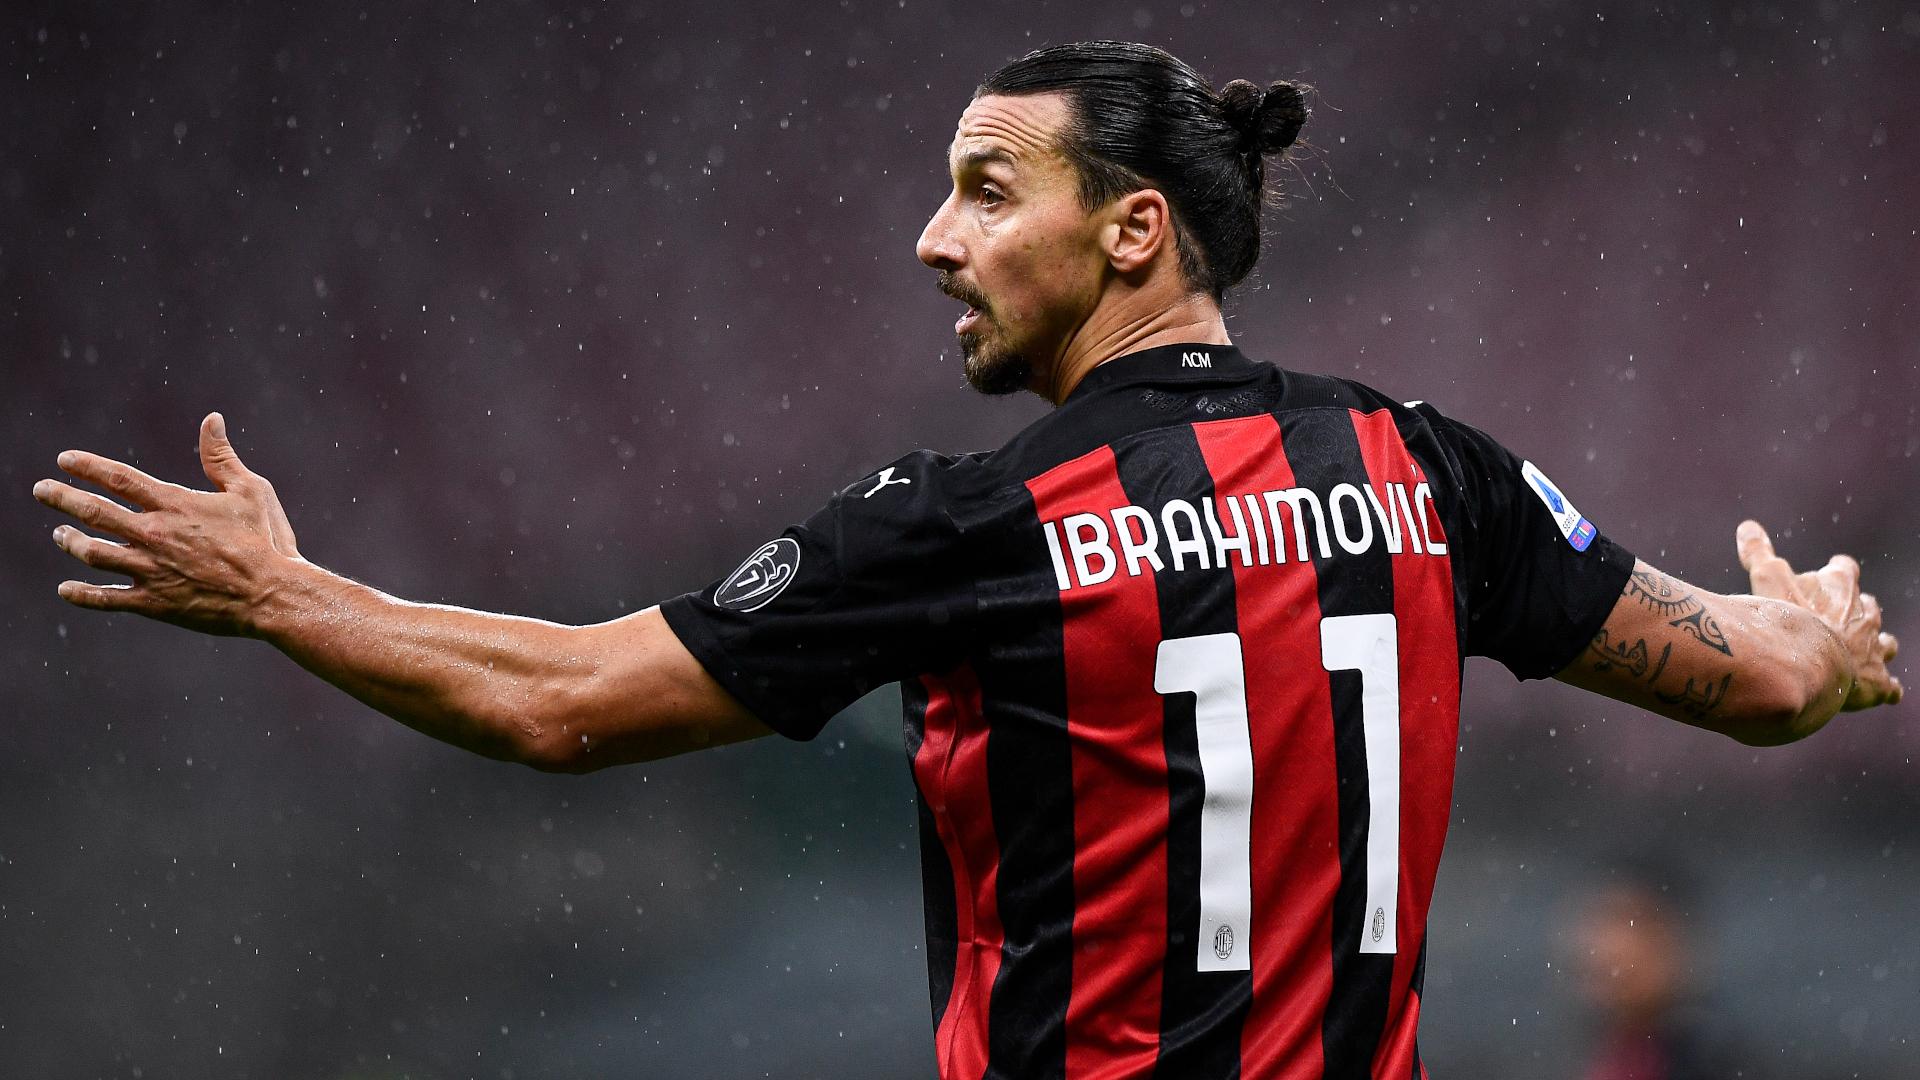 Milan, Ibrahimovic testimonial contro il Covid fa impazzire i social -  Virgilio Sport